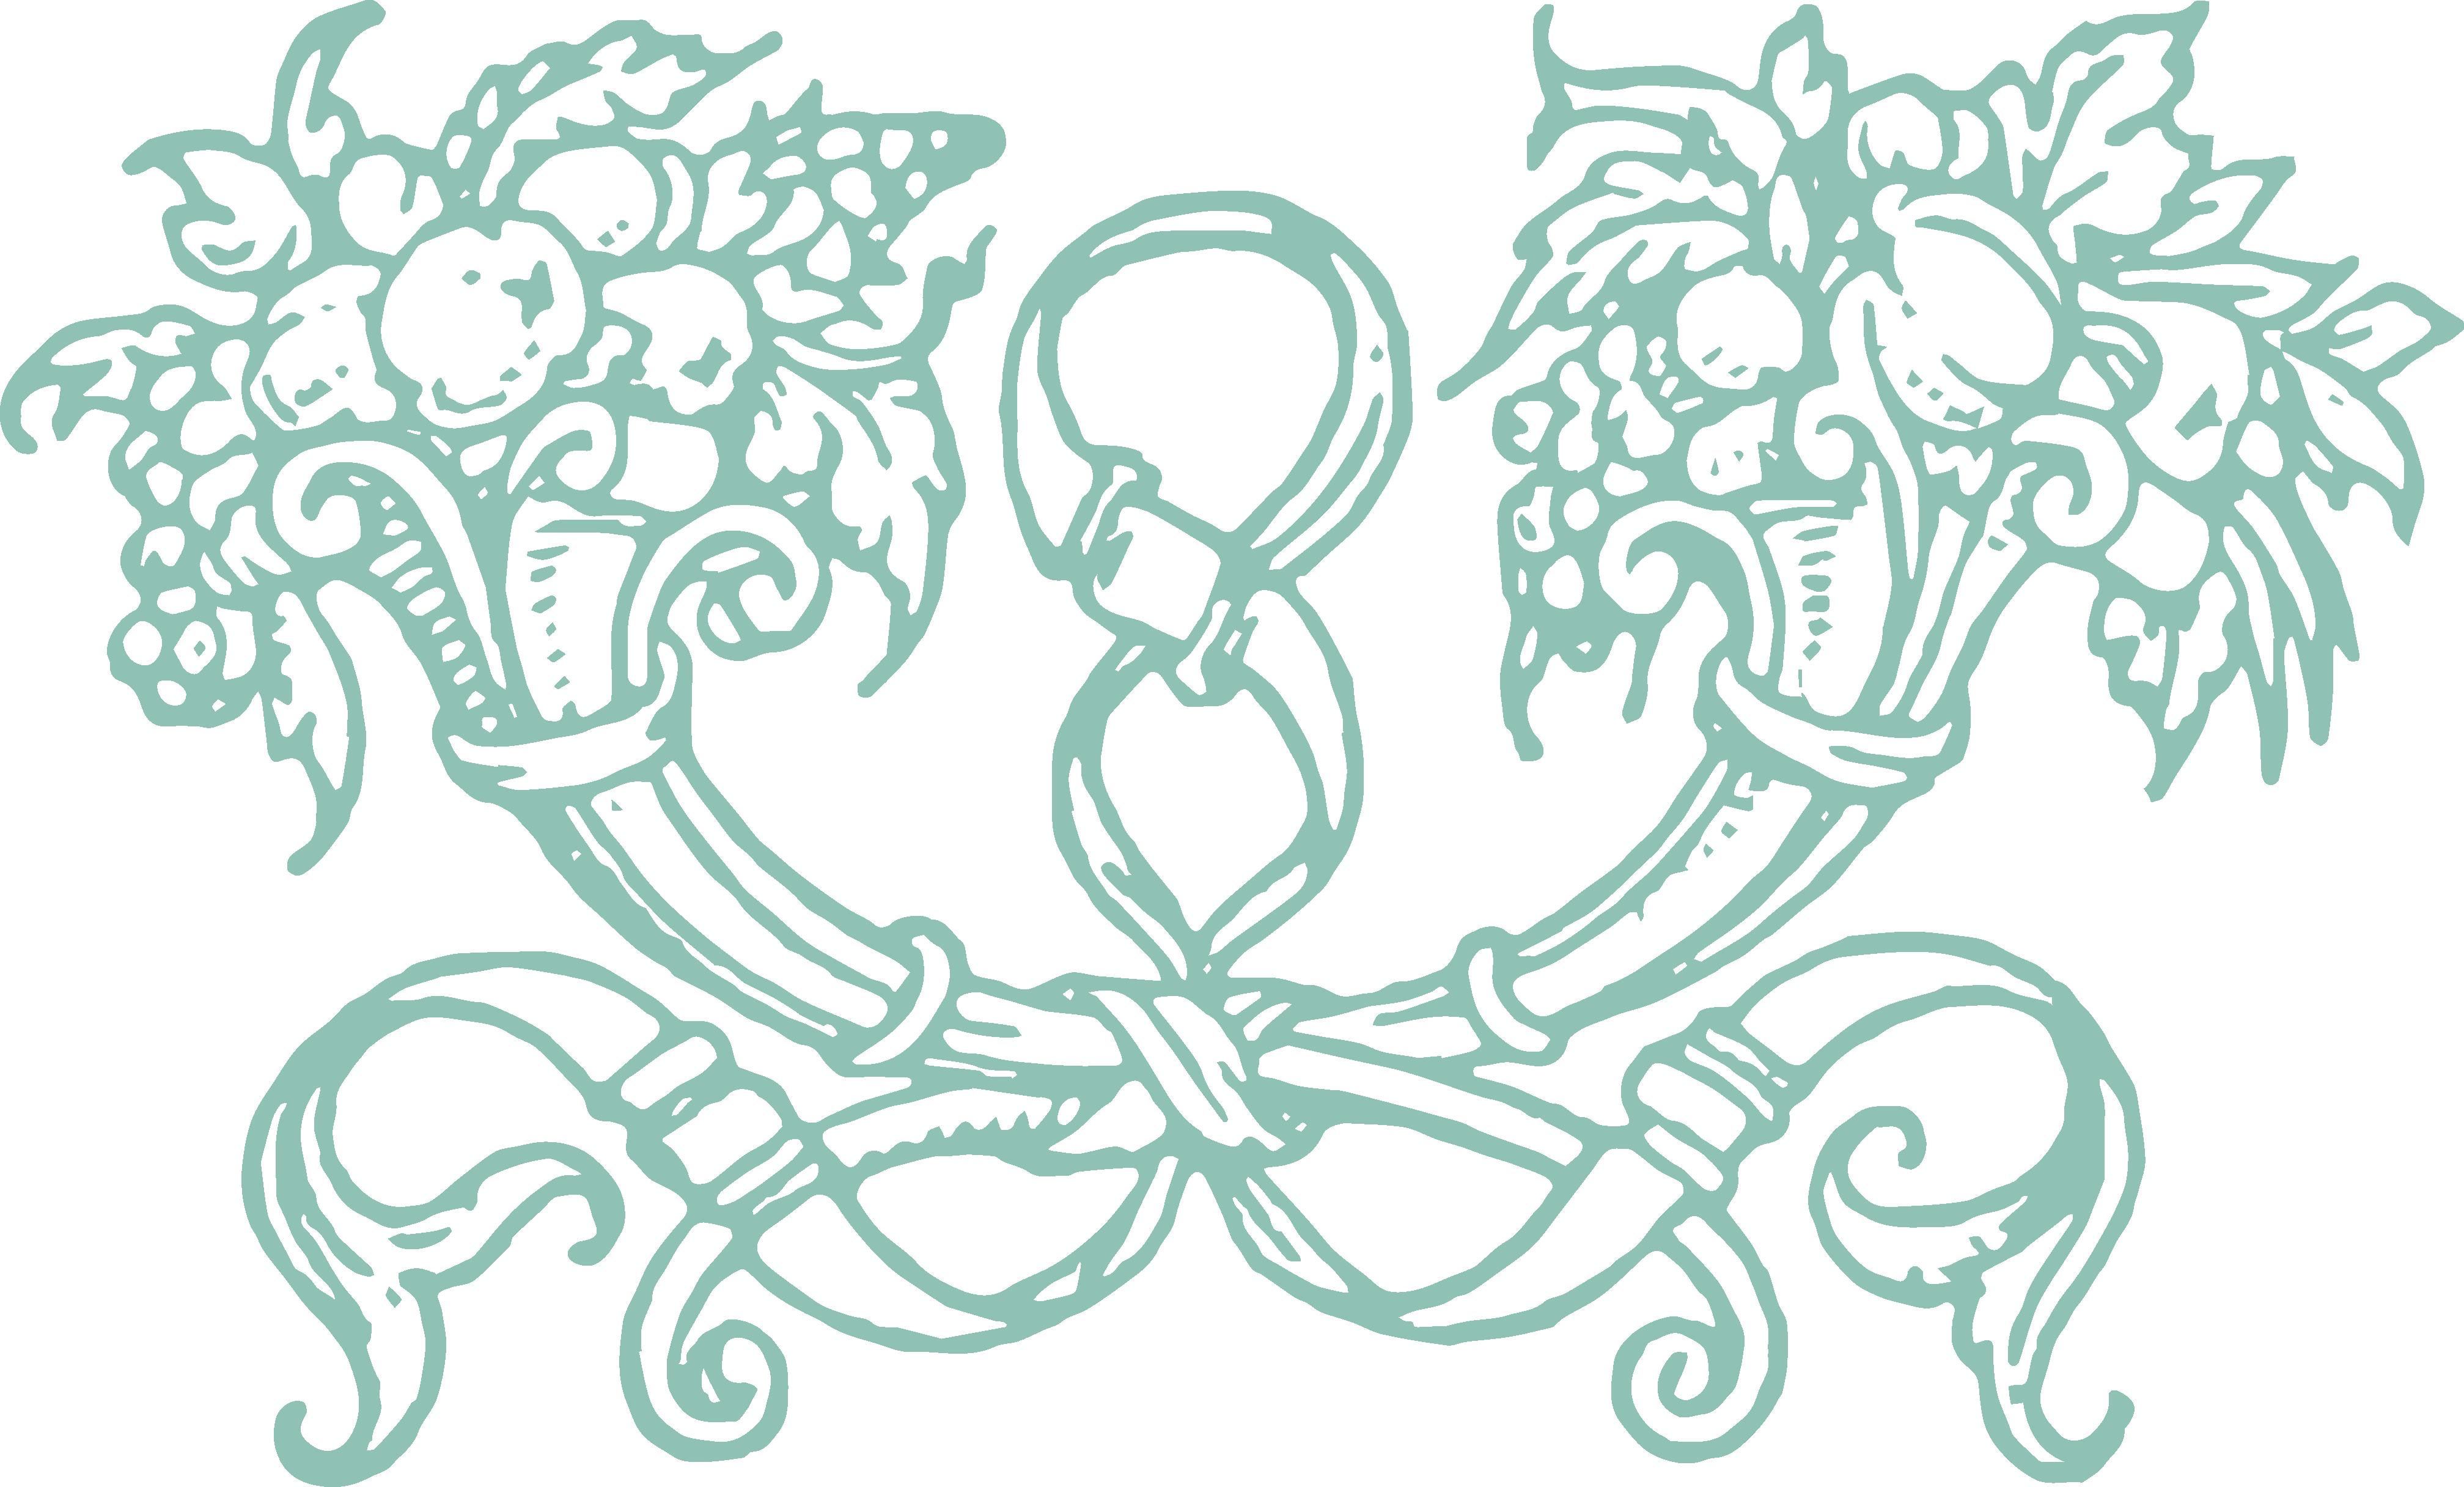 Thanksgiving cornucopia clipart pattern graphic free download Free Stock Vector & Clip Art - Decorative Cornucopia Ornament | Oh ... graphic free download